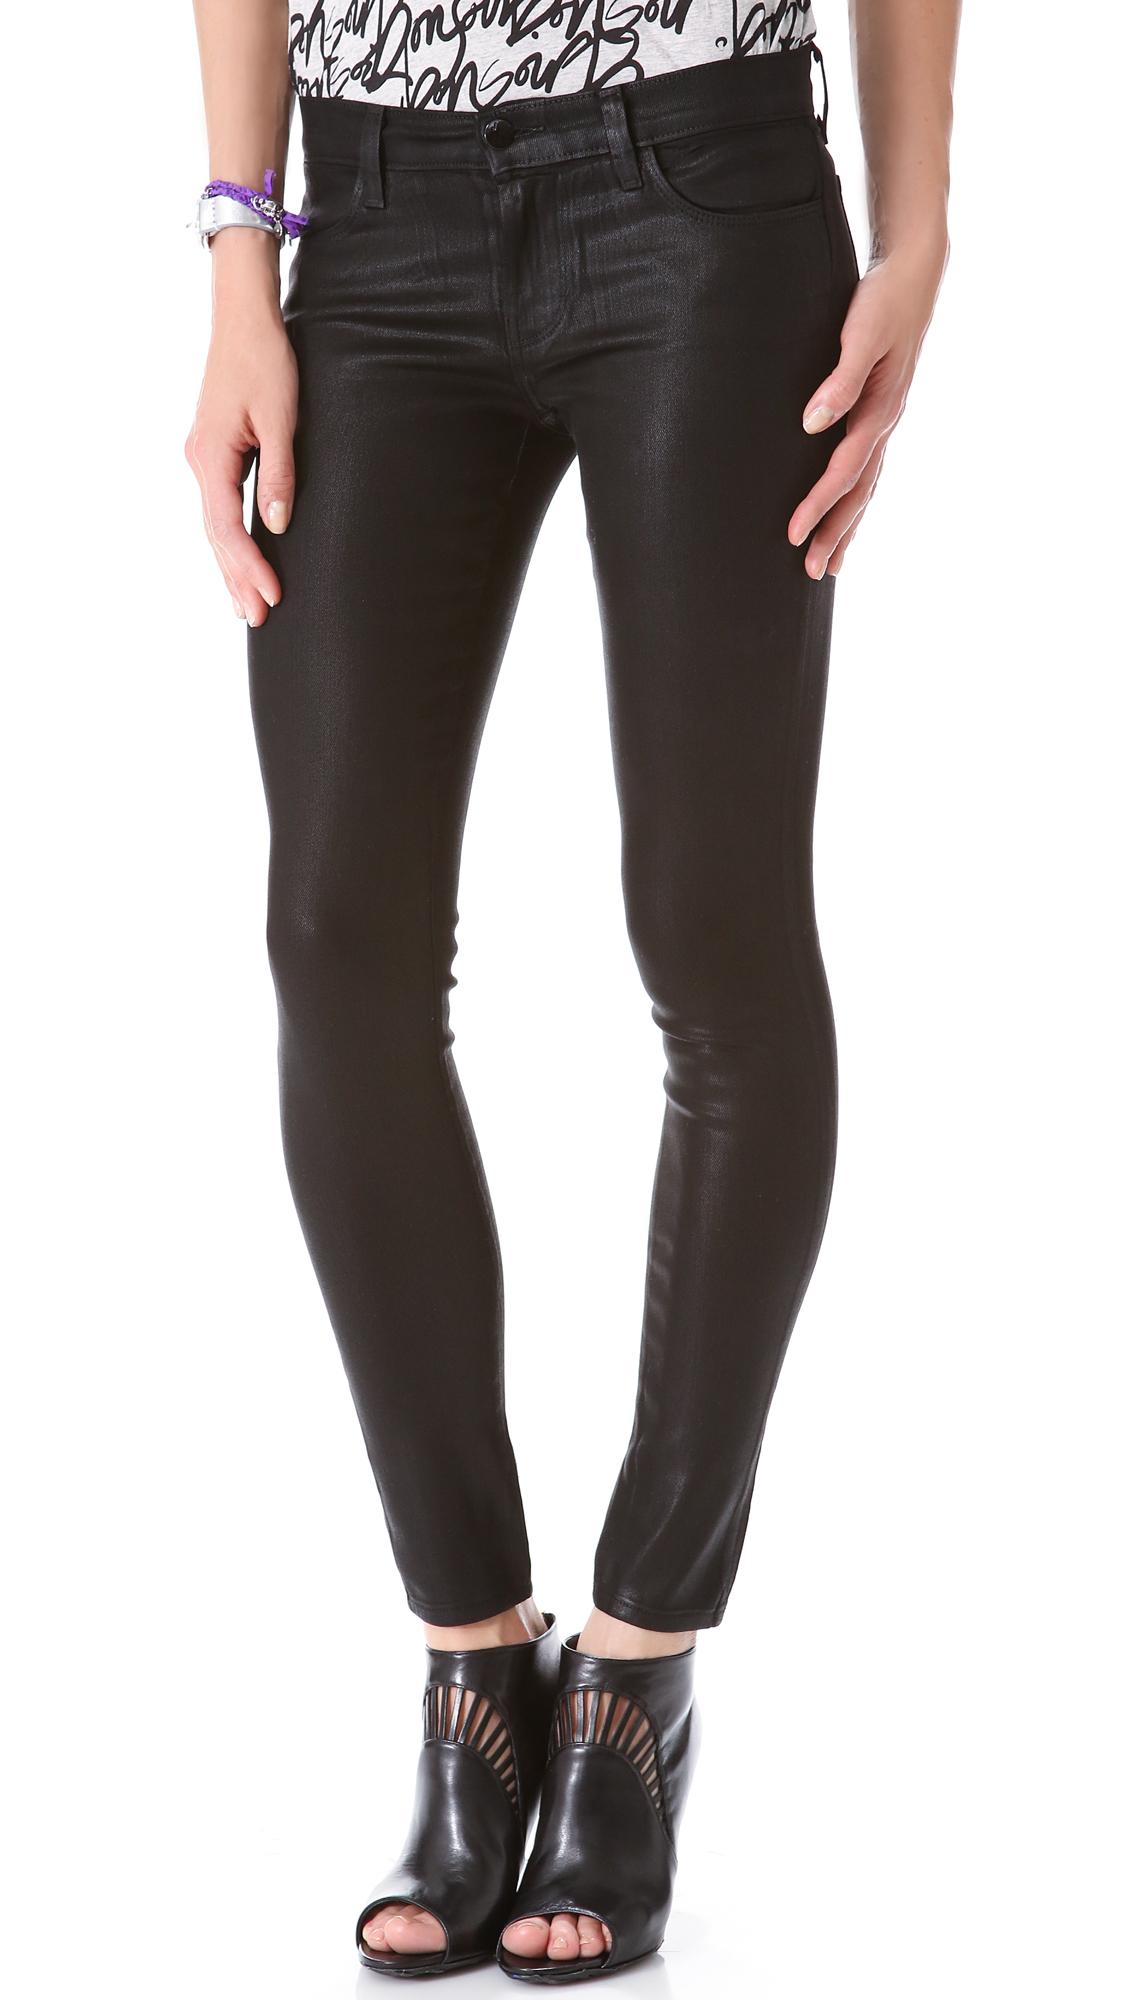 Black coated skinny jeans nz